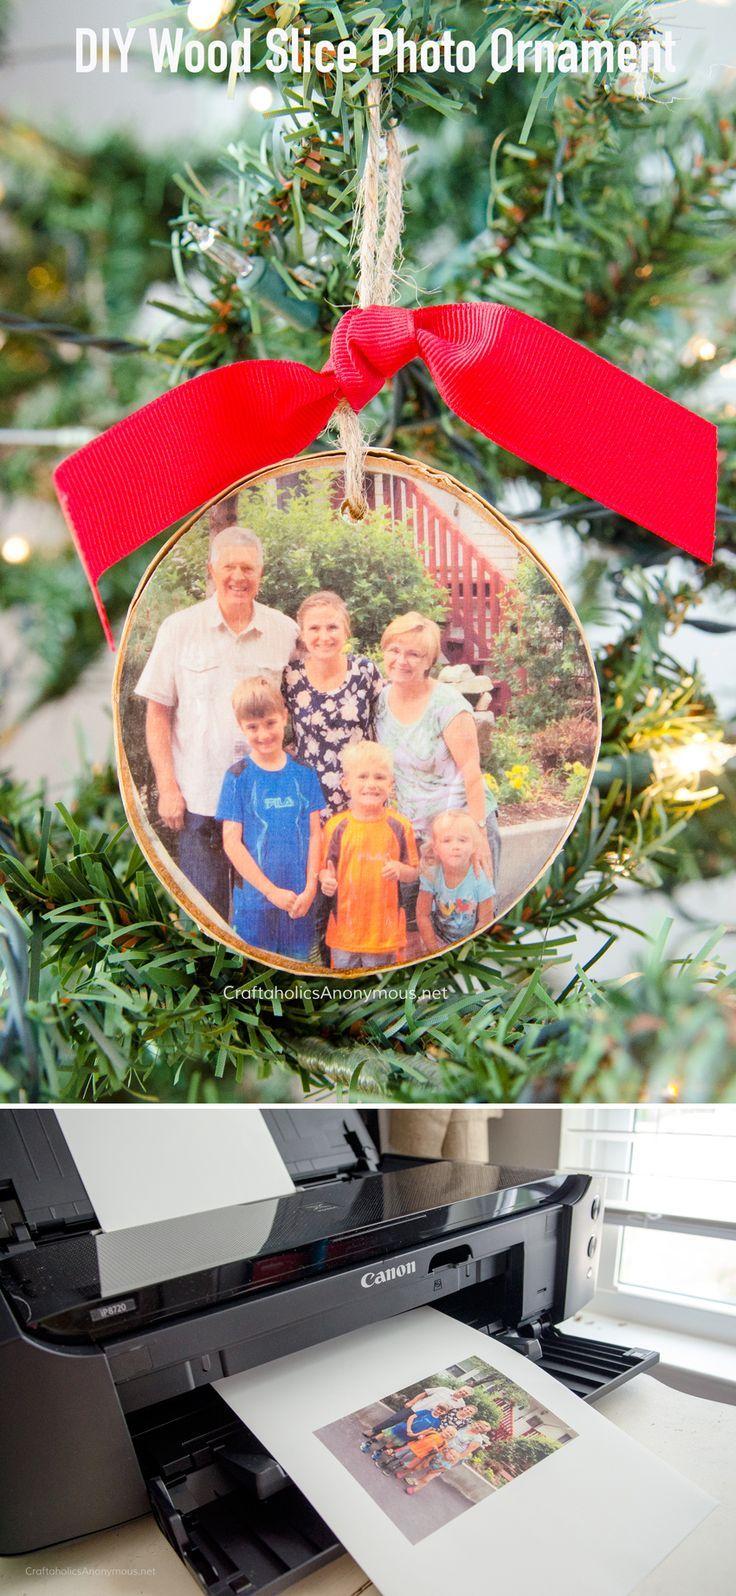 DIY Wood Slice Photo Ornament | Pinterest | Tutorials, Craft and Gift